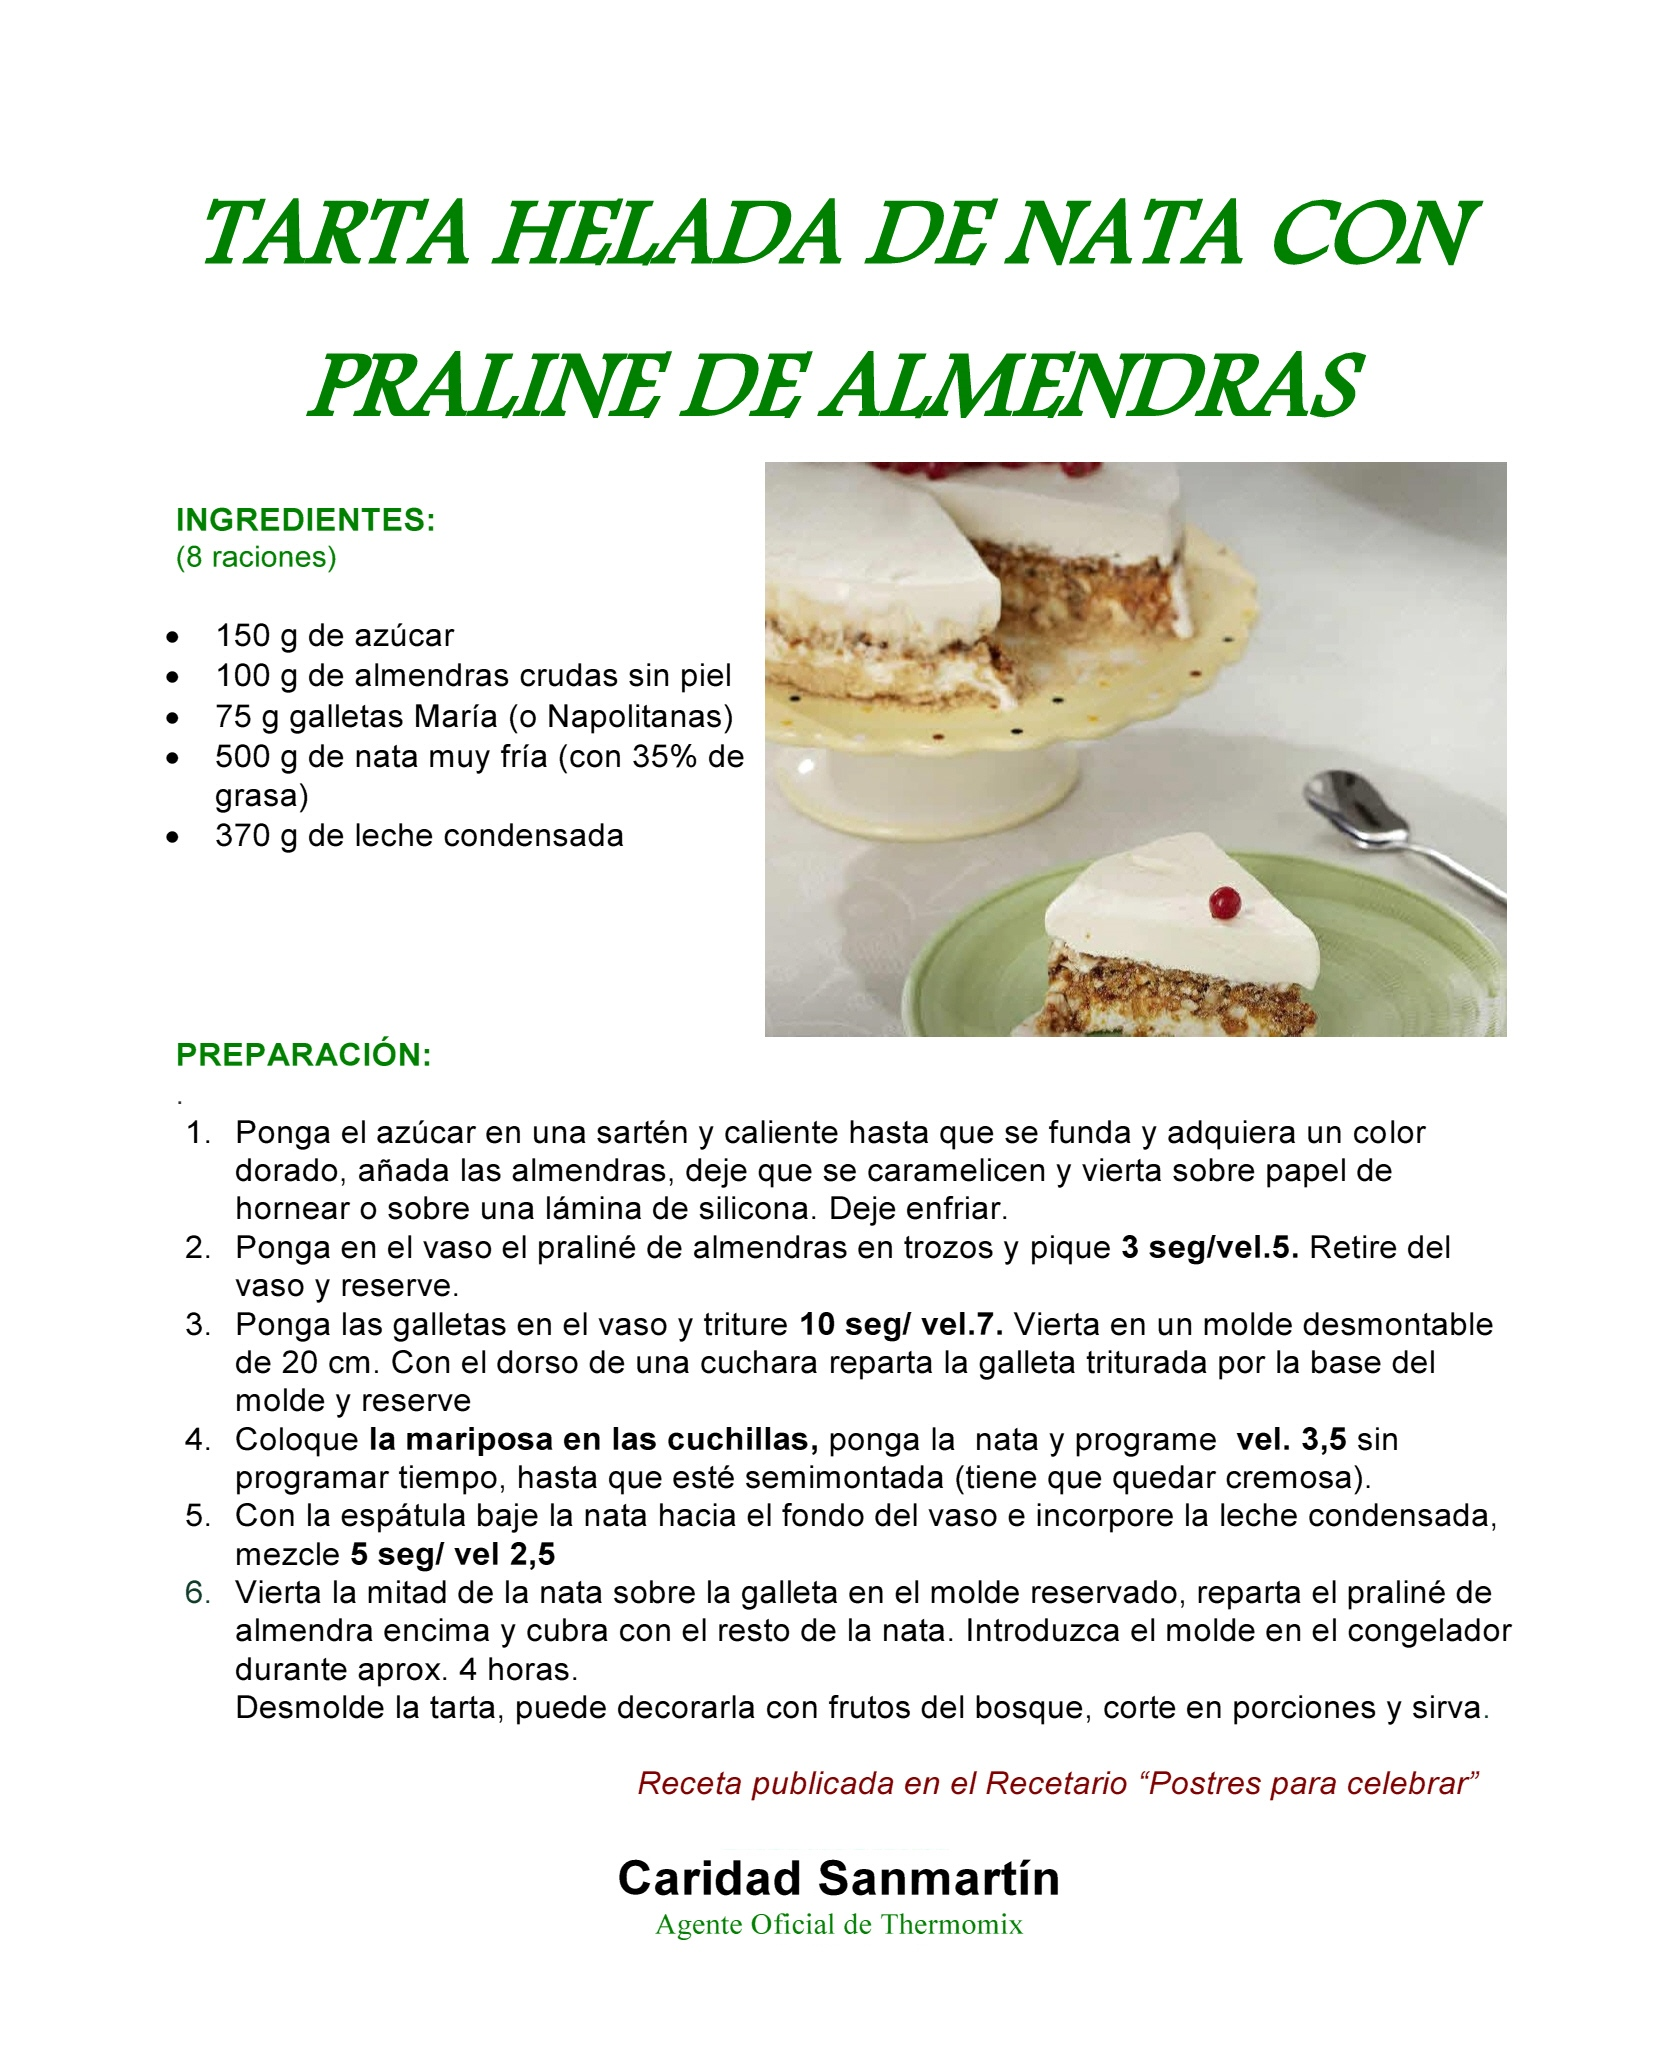 TARTA HELADA DE NATA CON PRALINE DE ALMENDRAS